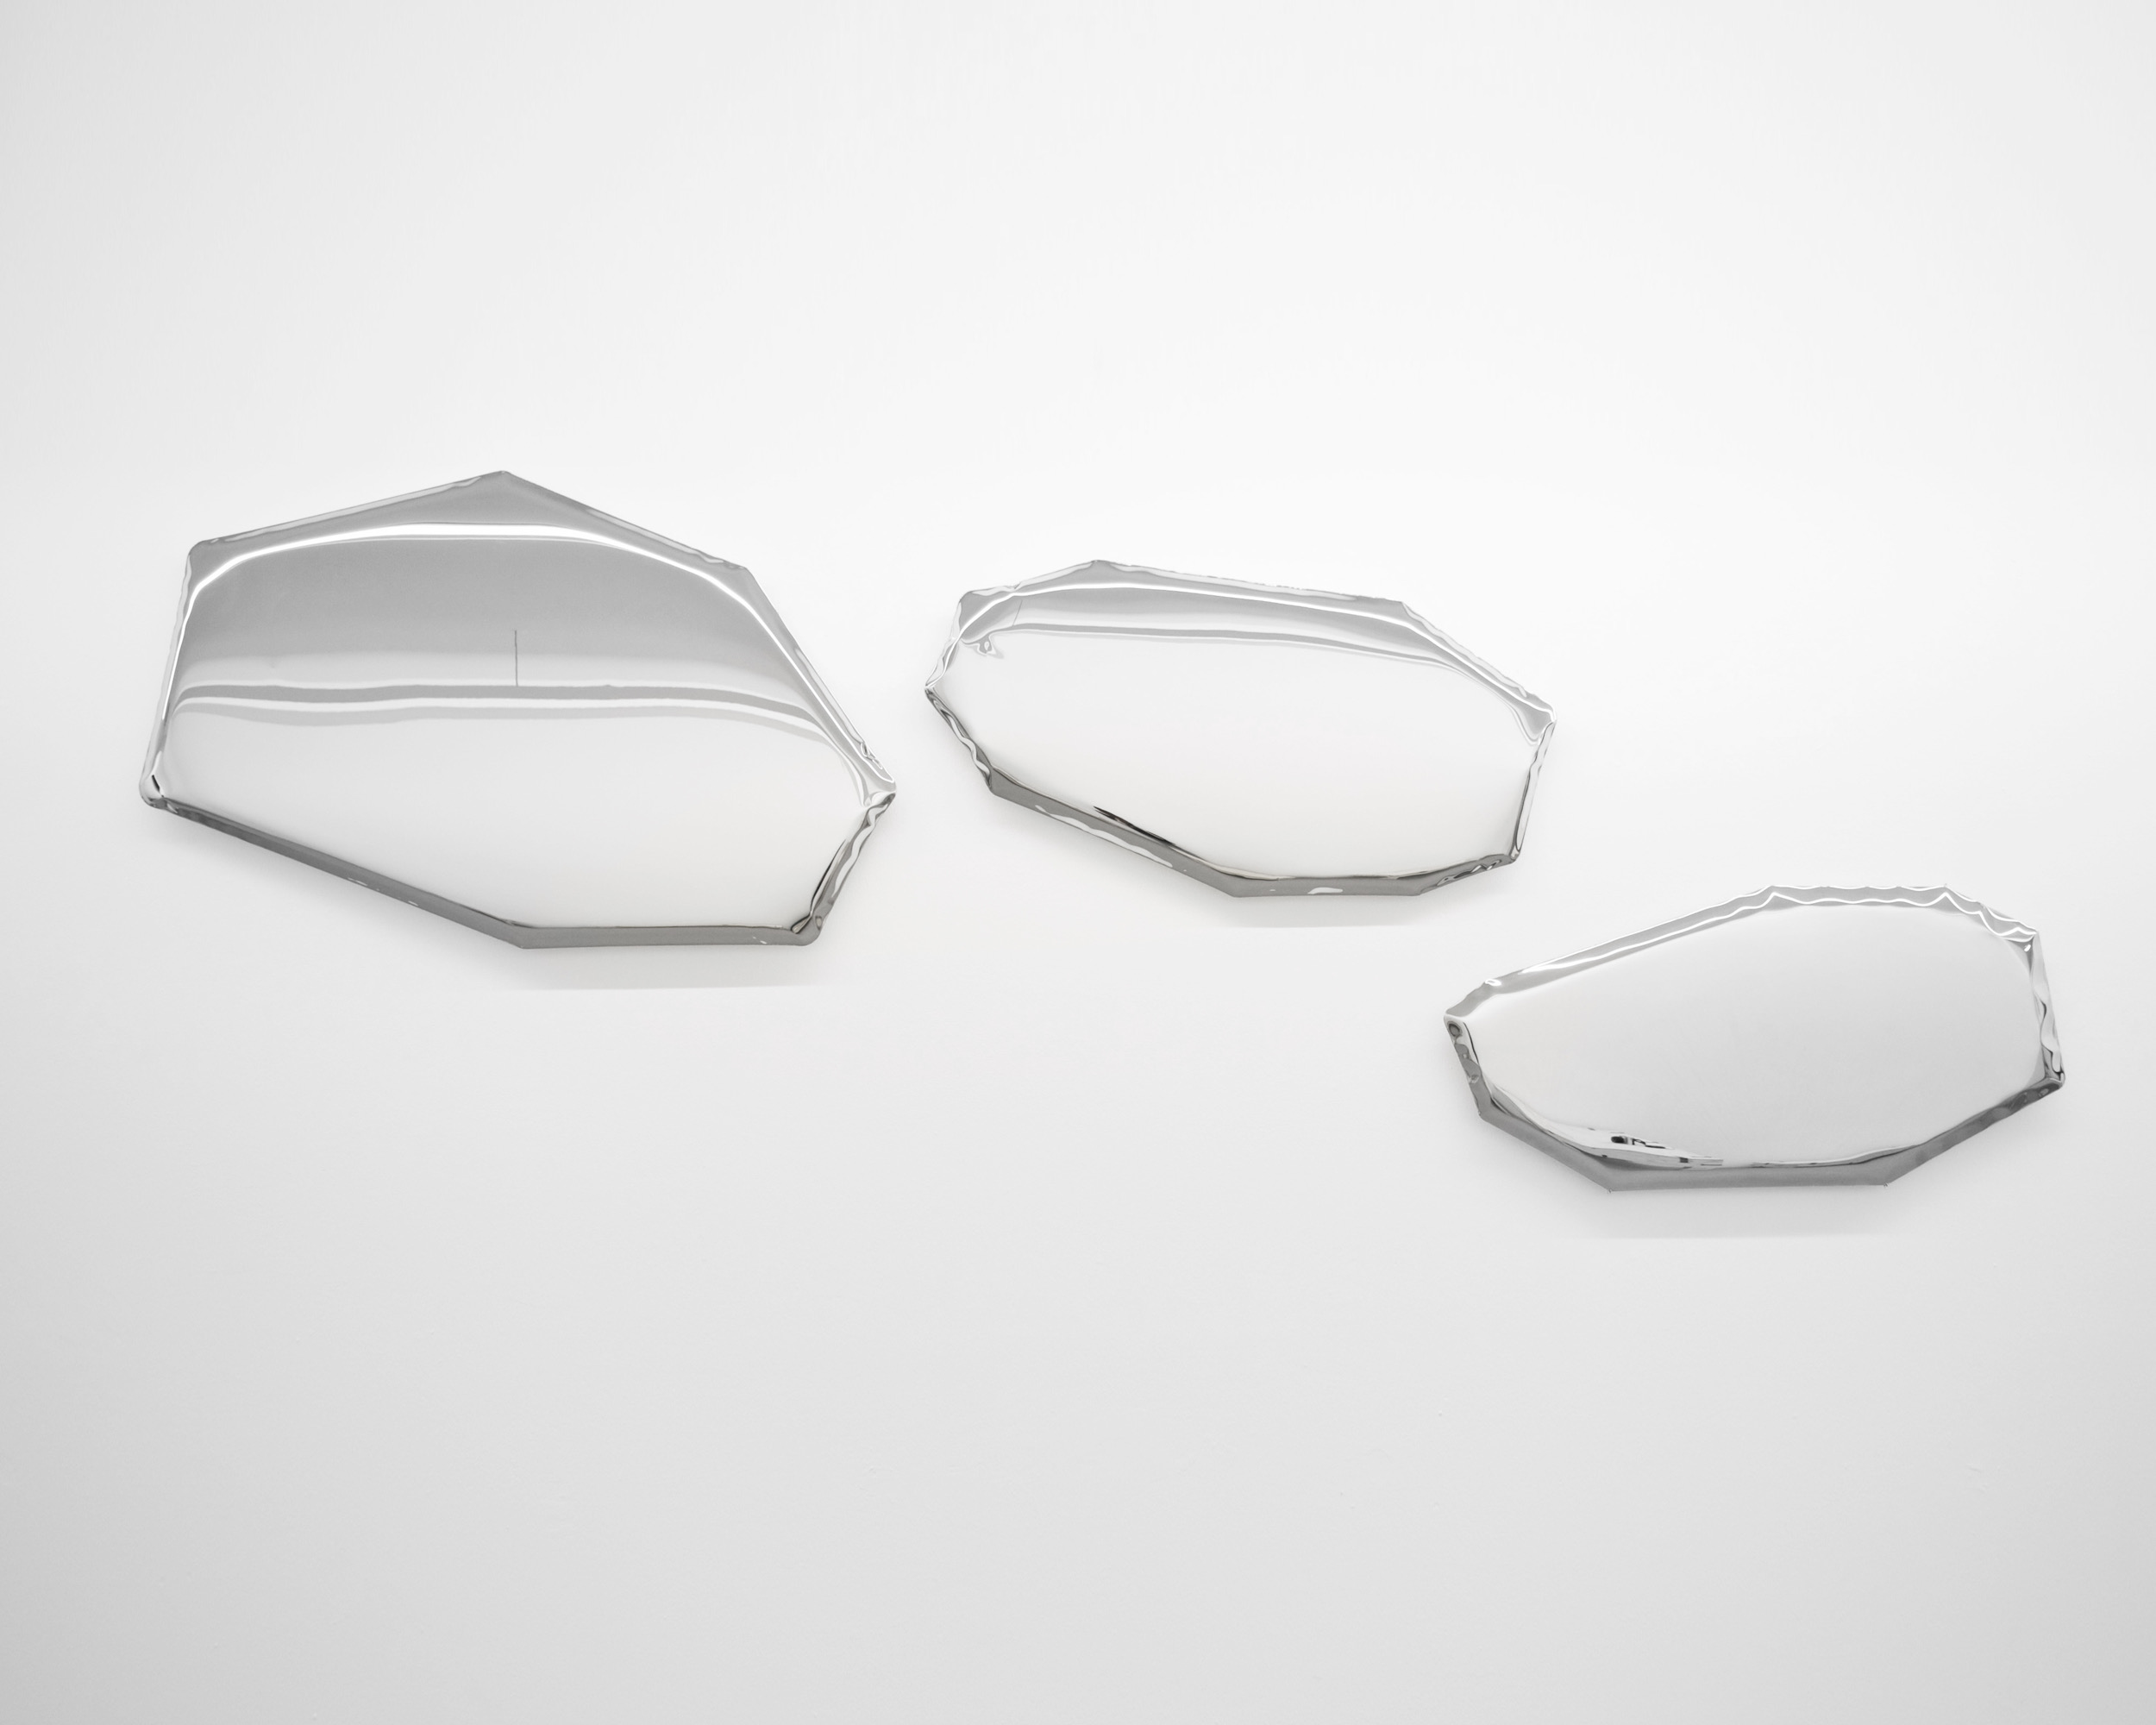 Zieta-Prozessdesign-Tafla-Mirror-Savannah-Bay-Gallery-4